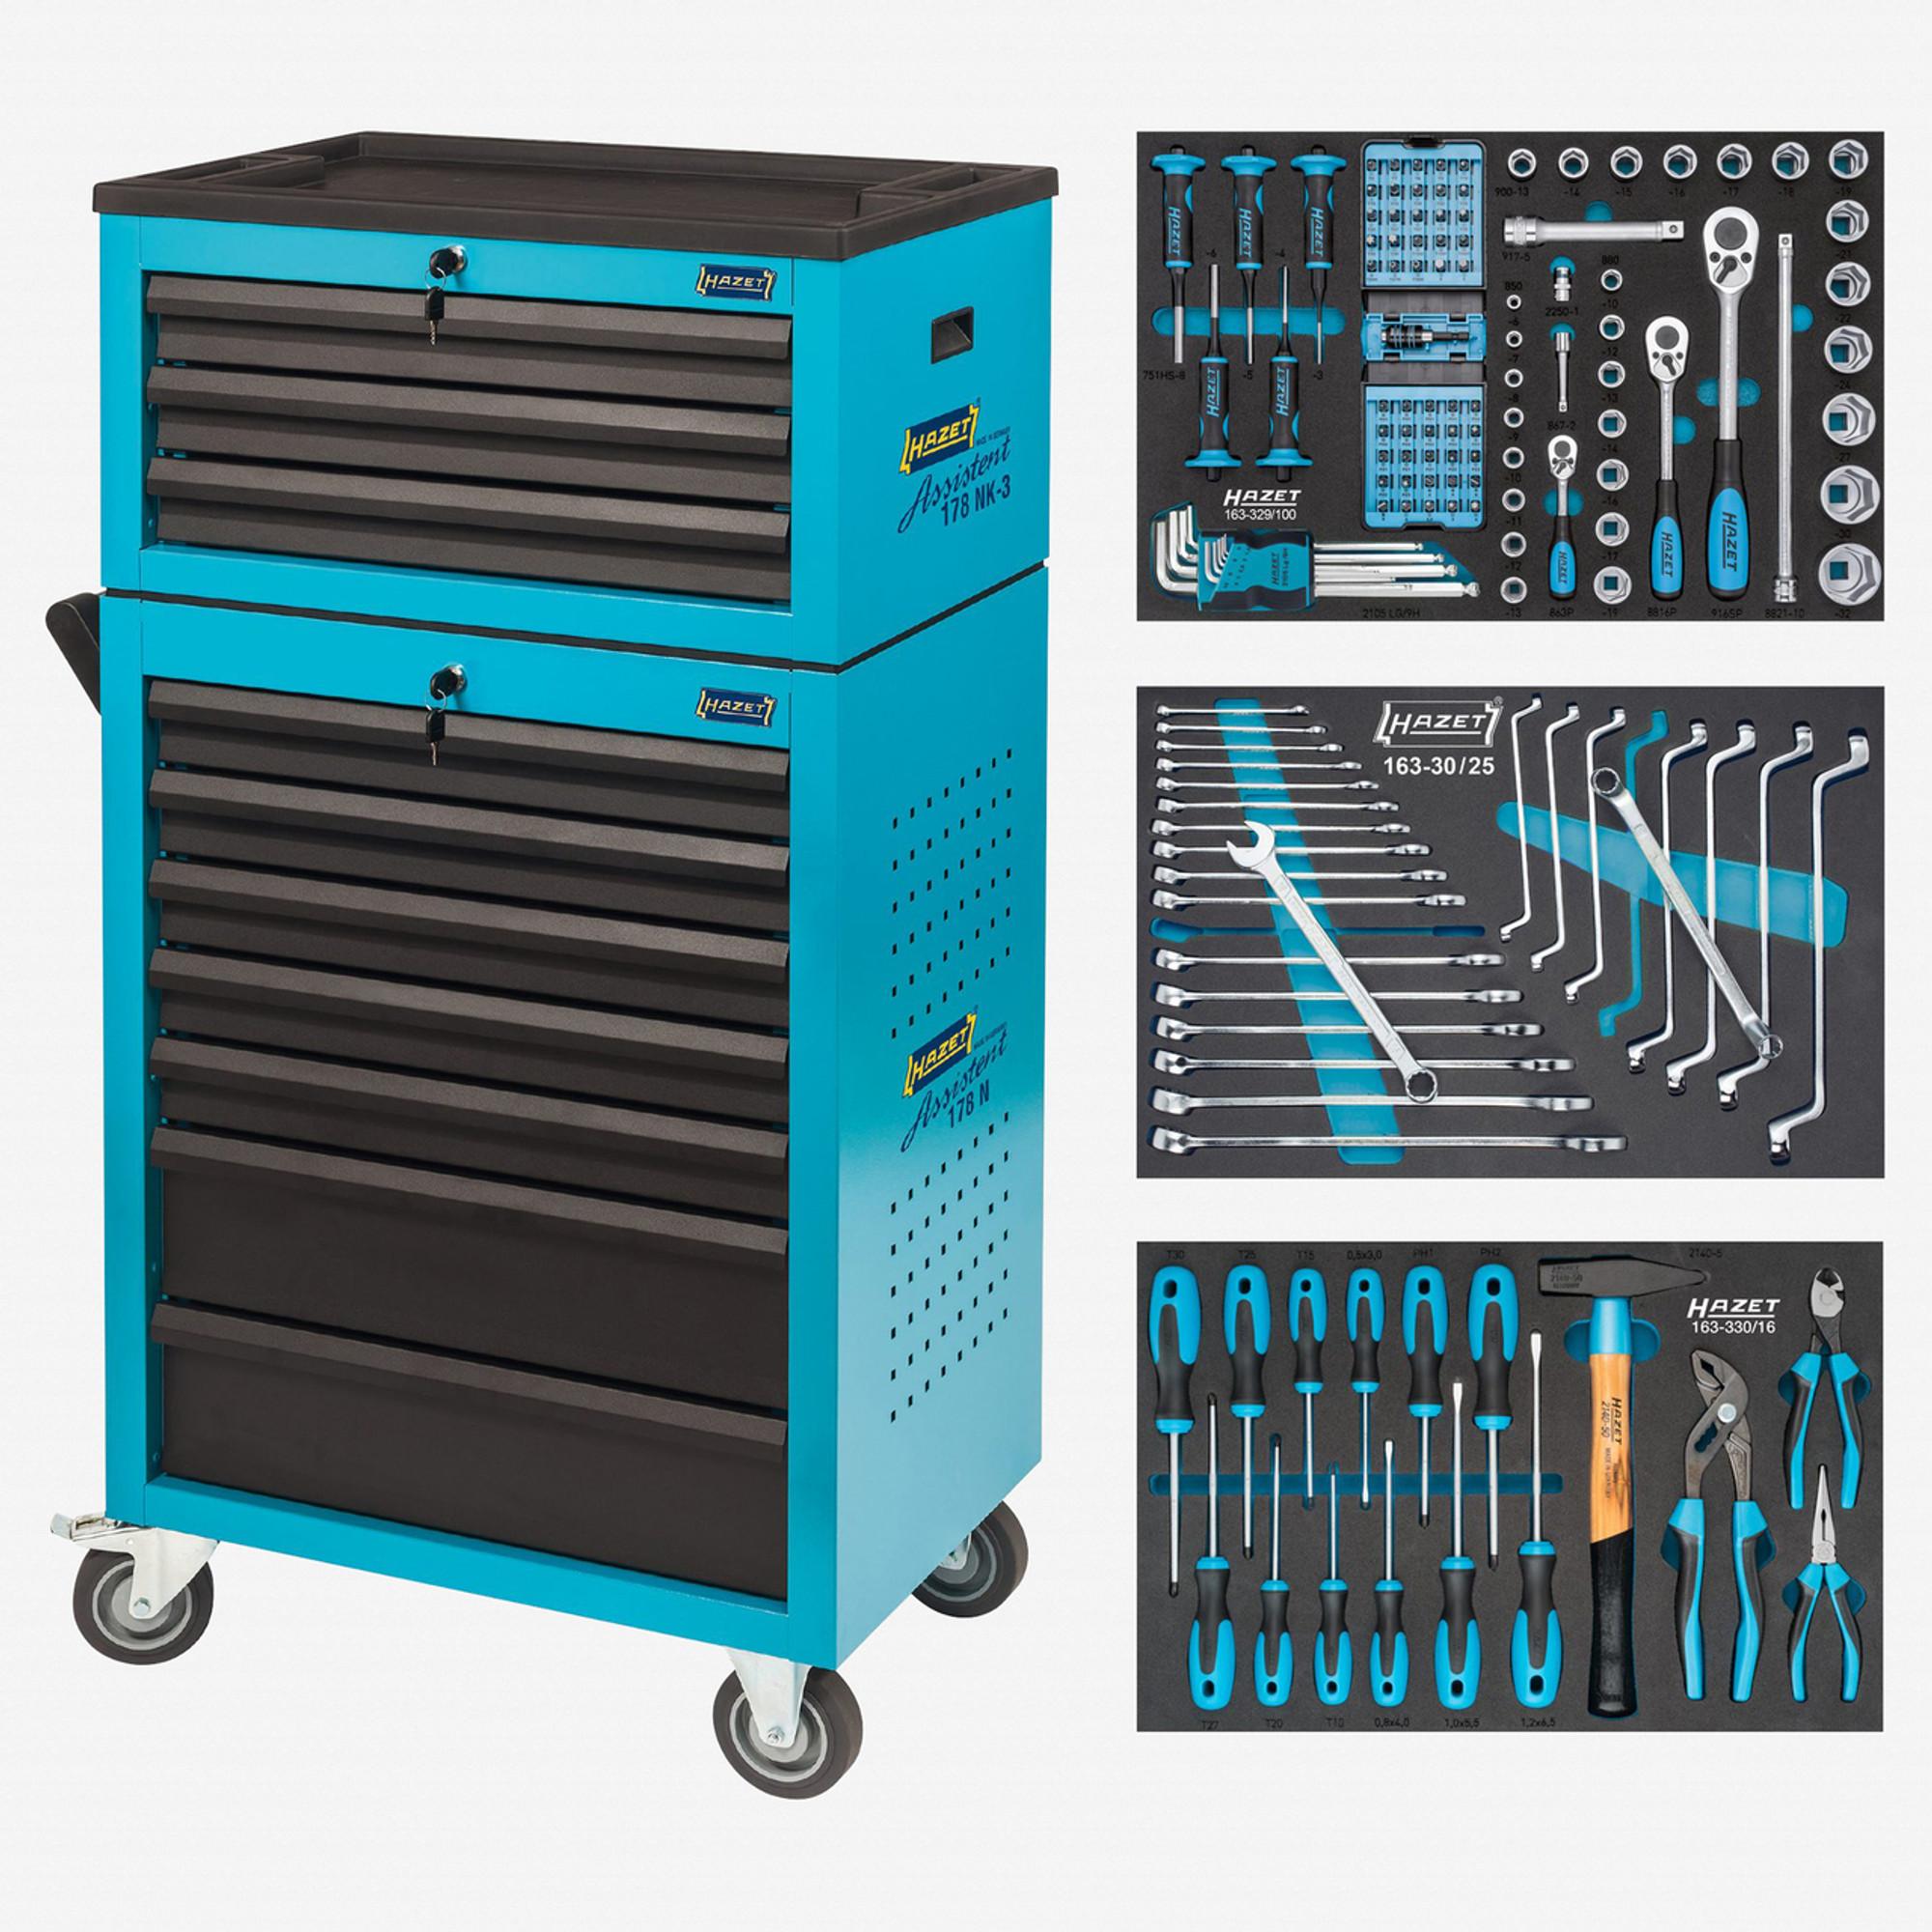 44c60961825efe Hazet 178N-10/141 Tool trolley Assistent 178 N-7 with 141 tools Tool ...